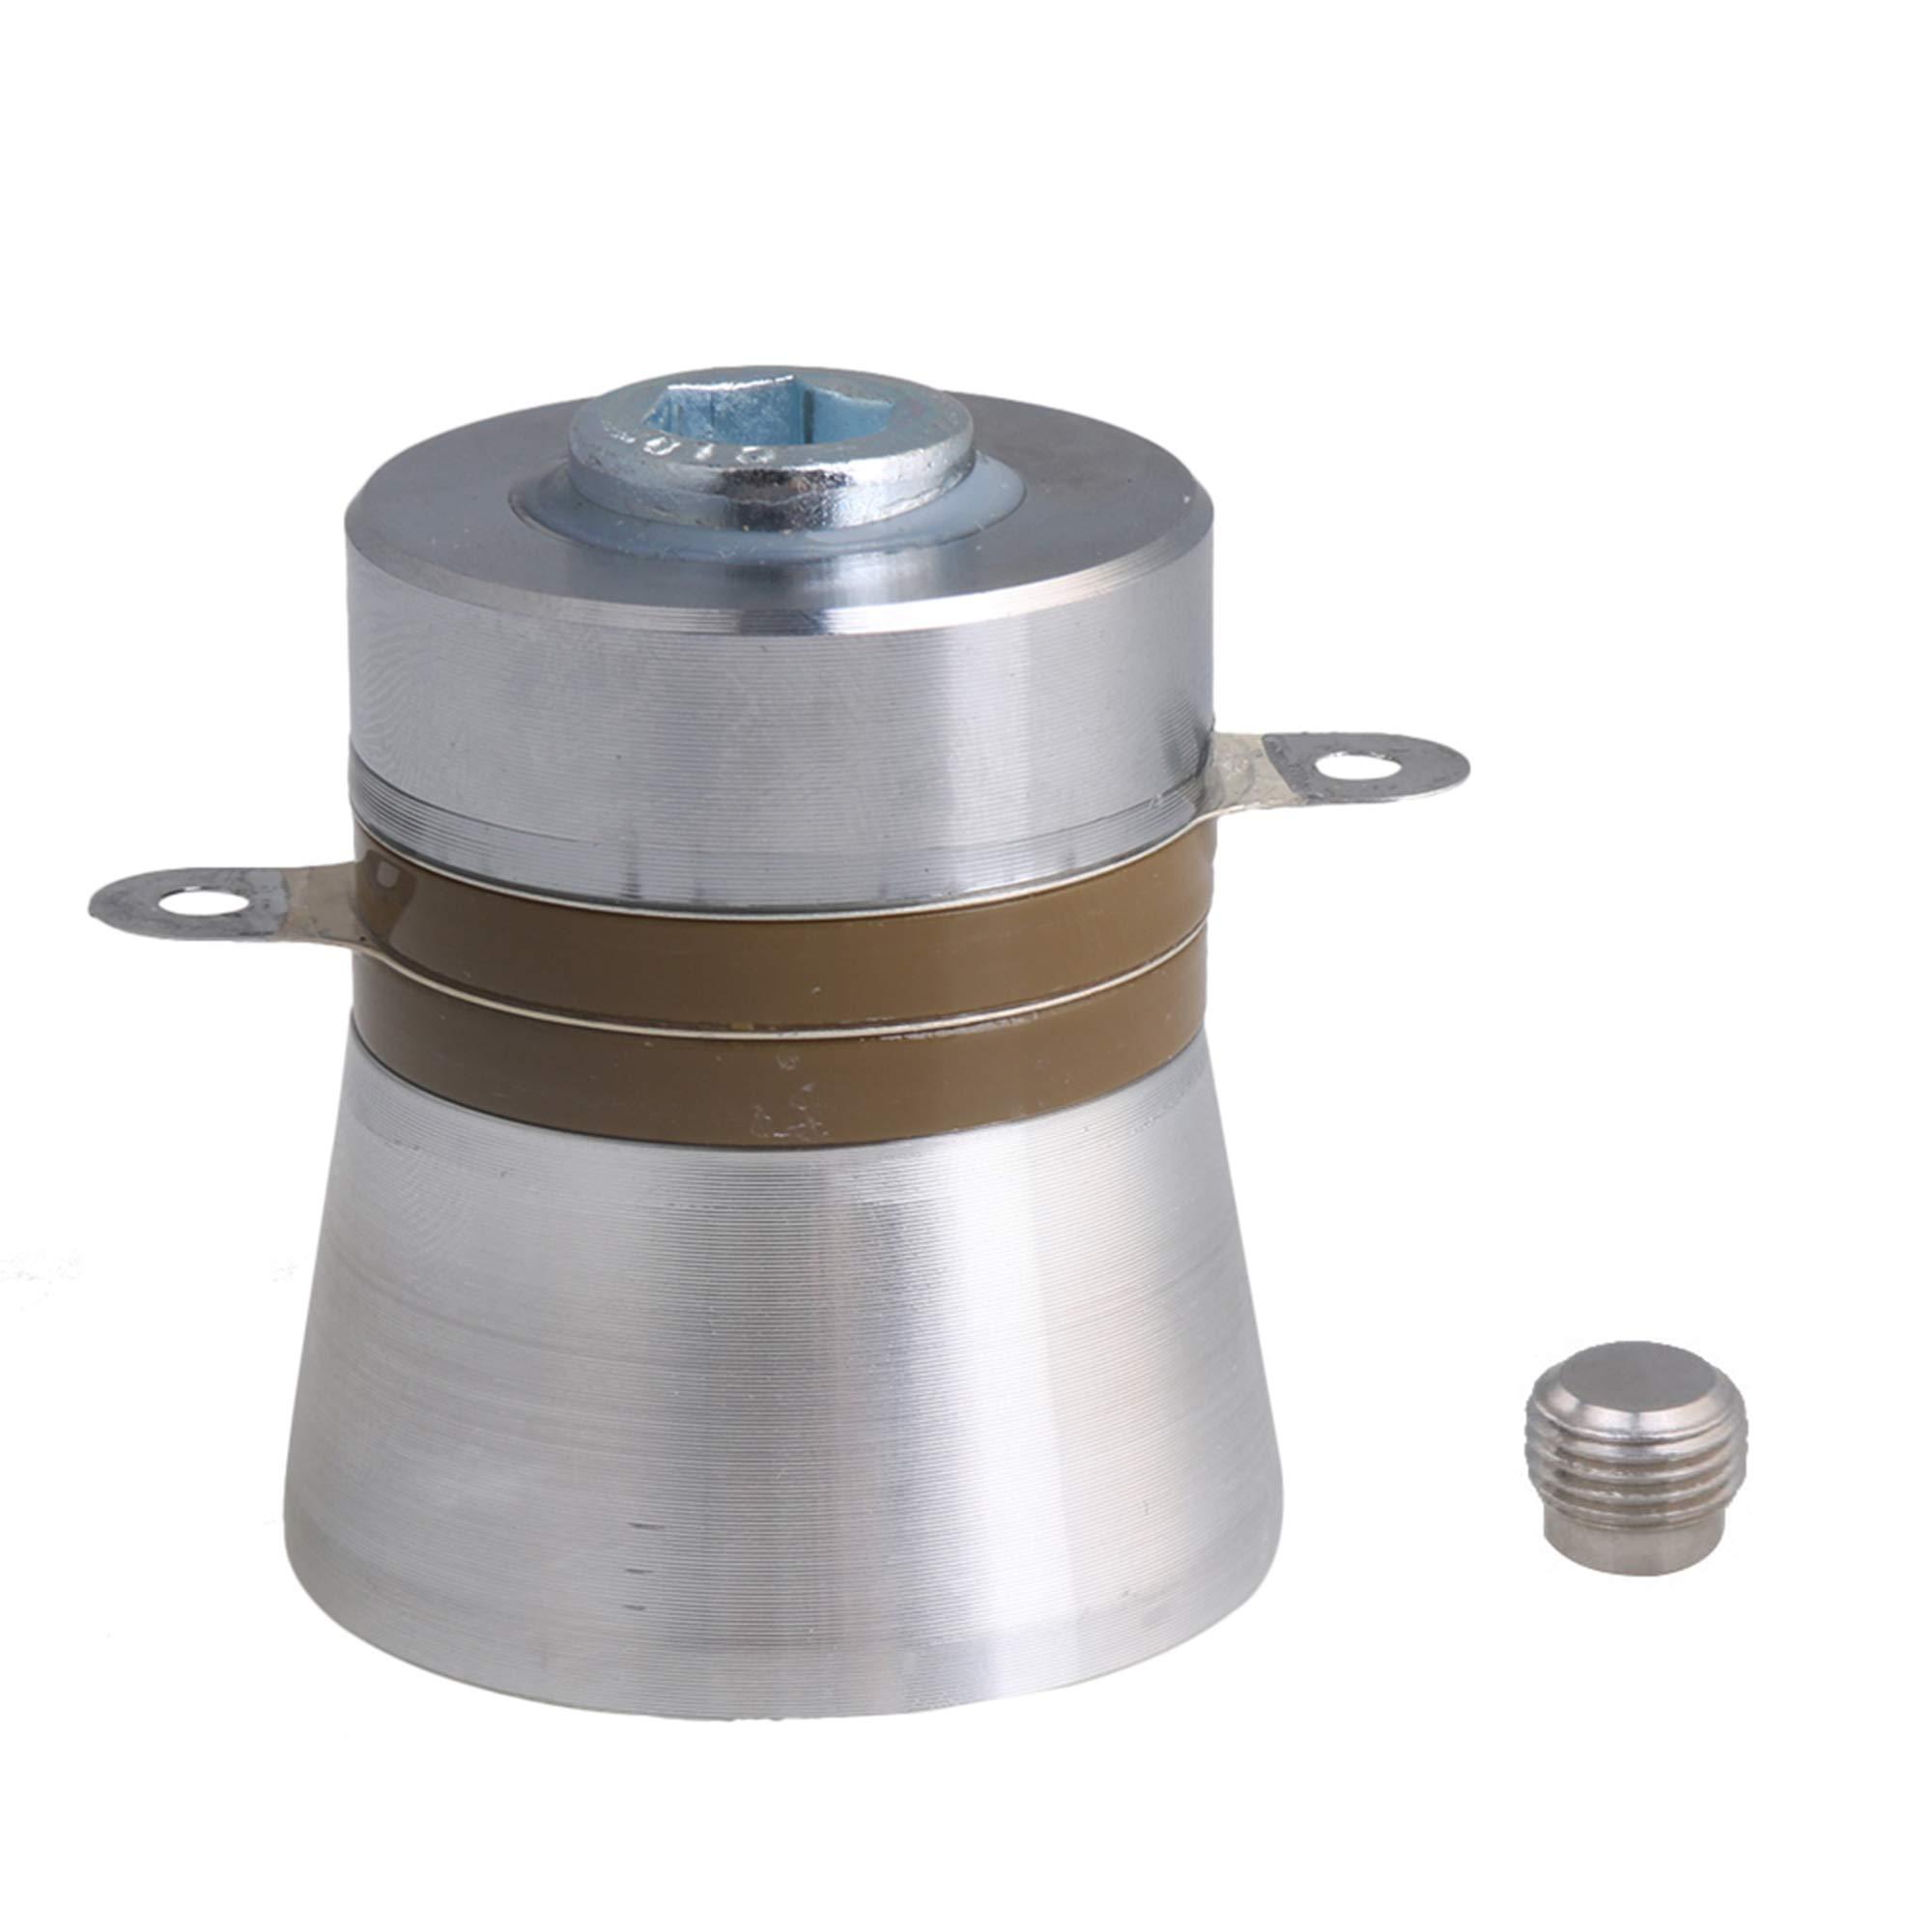 BQLZR High Conversion Efficiency 60W 40KHz Ultrasonic Piezoelectric Transducer